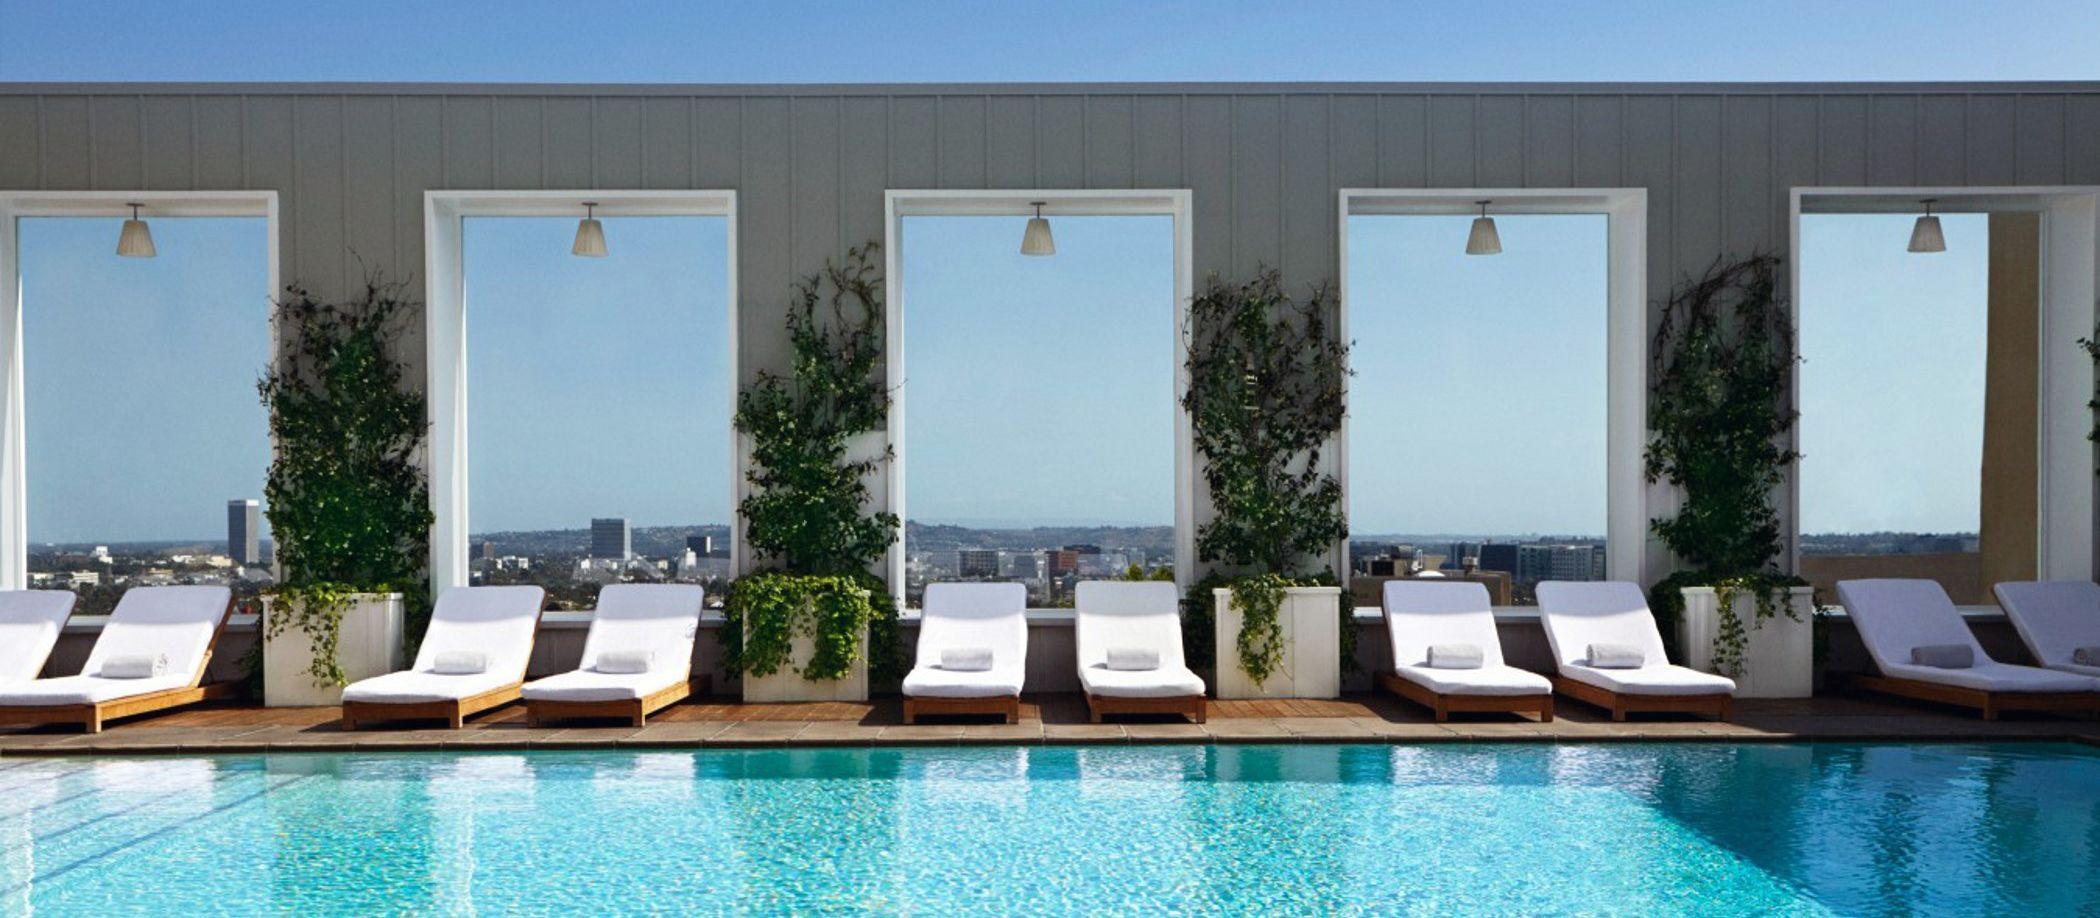 Mondrian Hotel, Pool